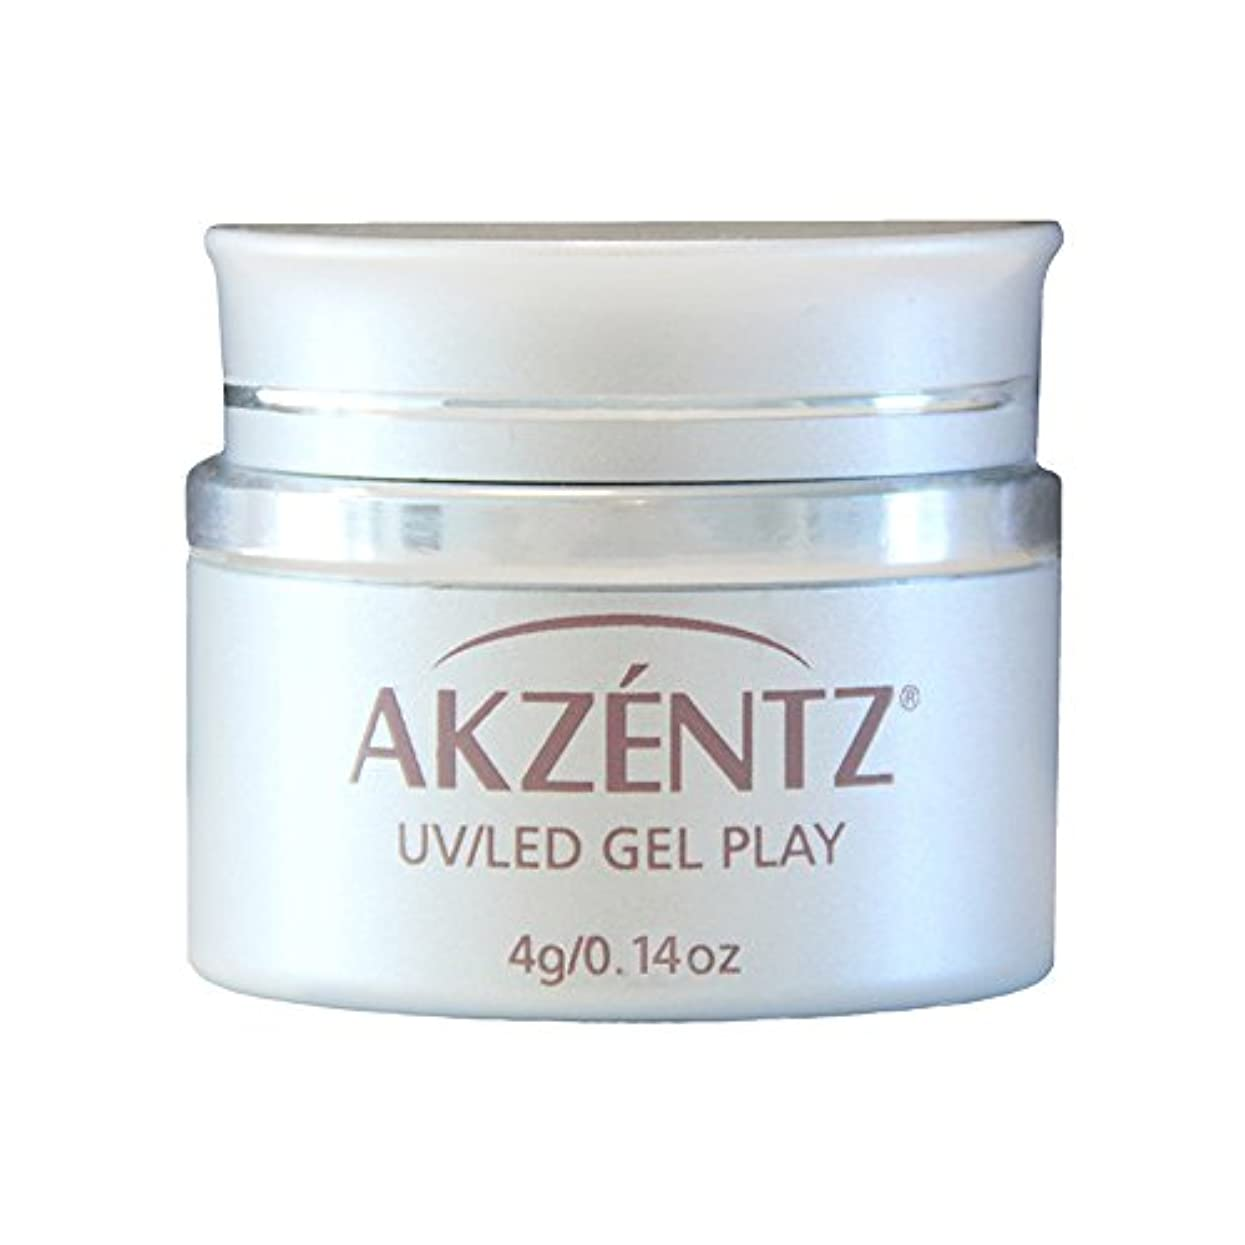 AKZENTZ カラージェル ジェルプレイ ペイントパープル 4g UV/LED対応